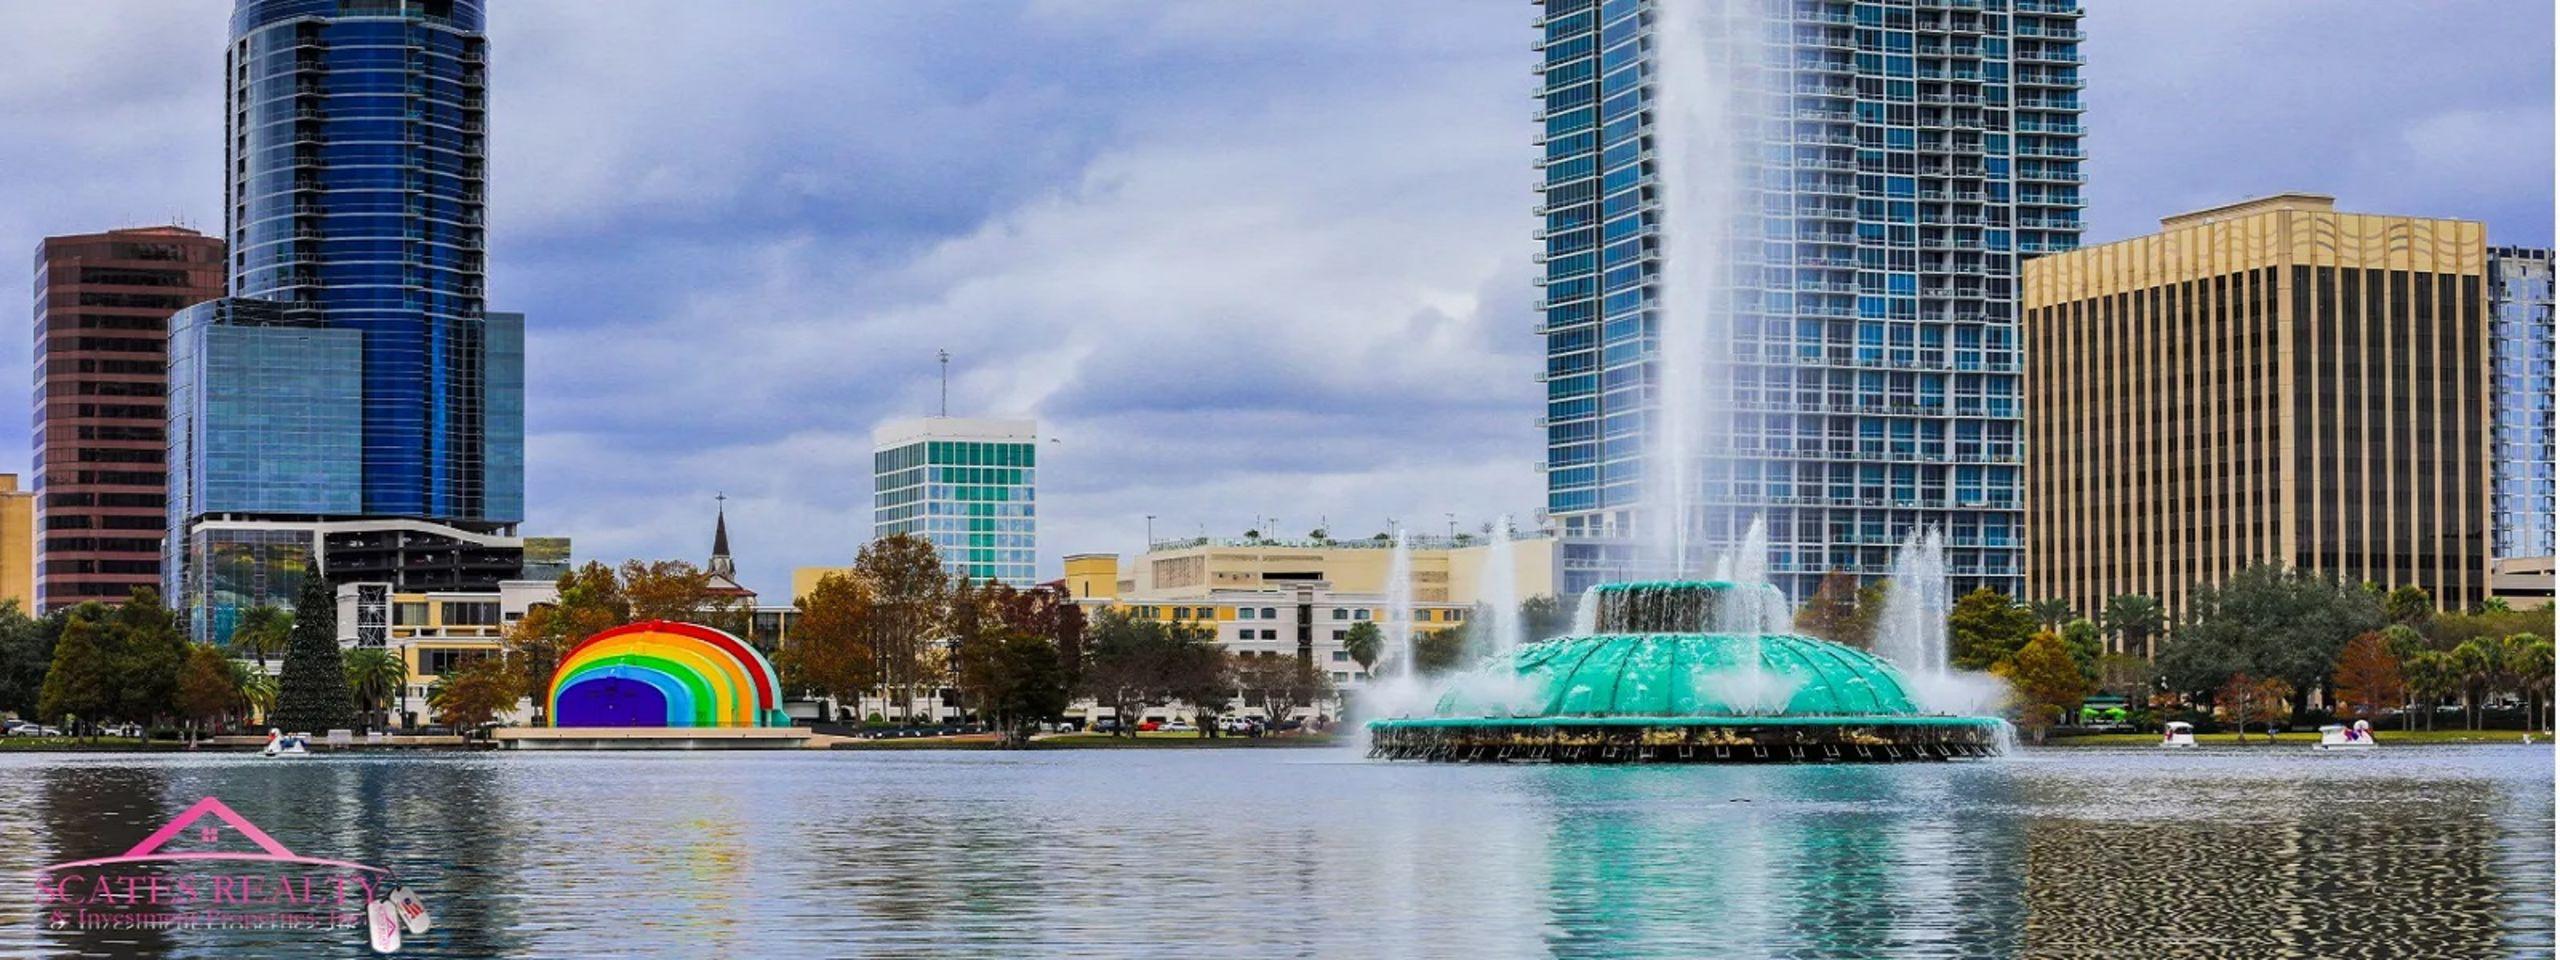 Orlando, The City Beautiful